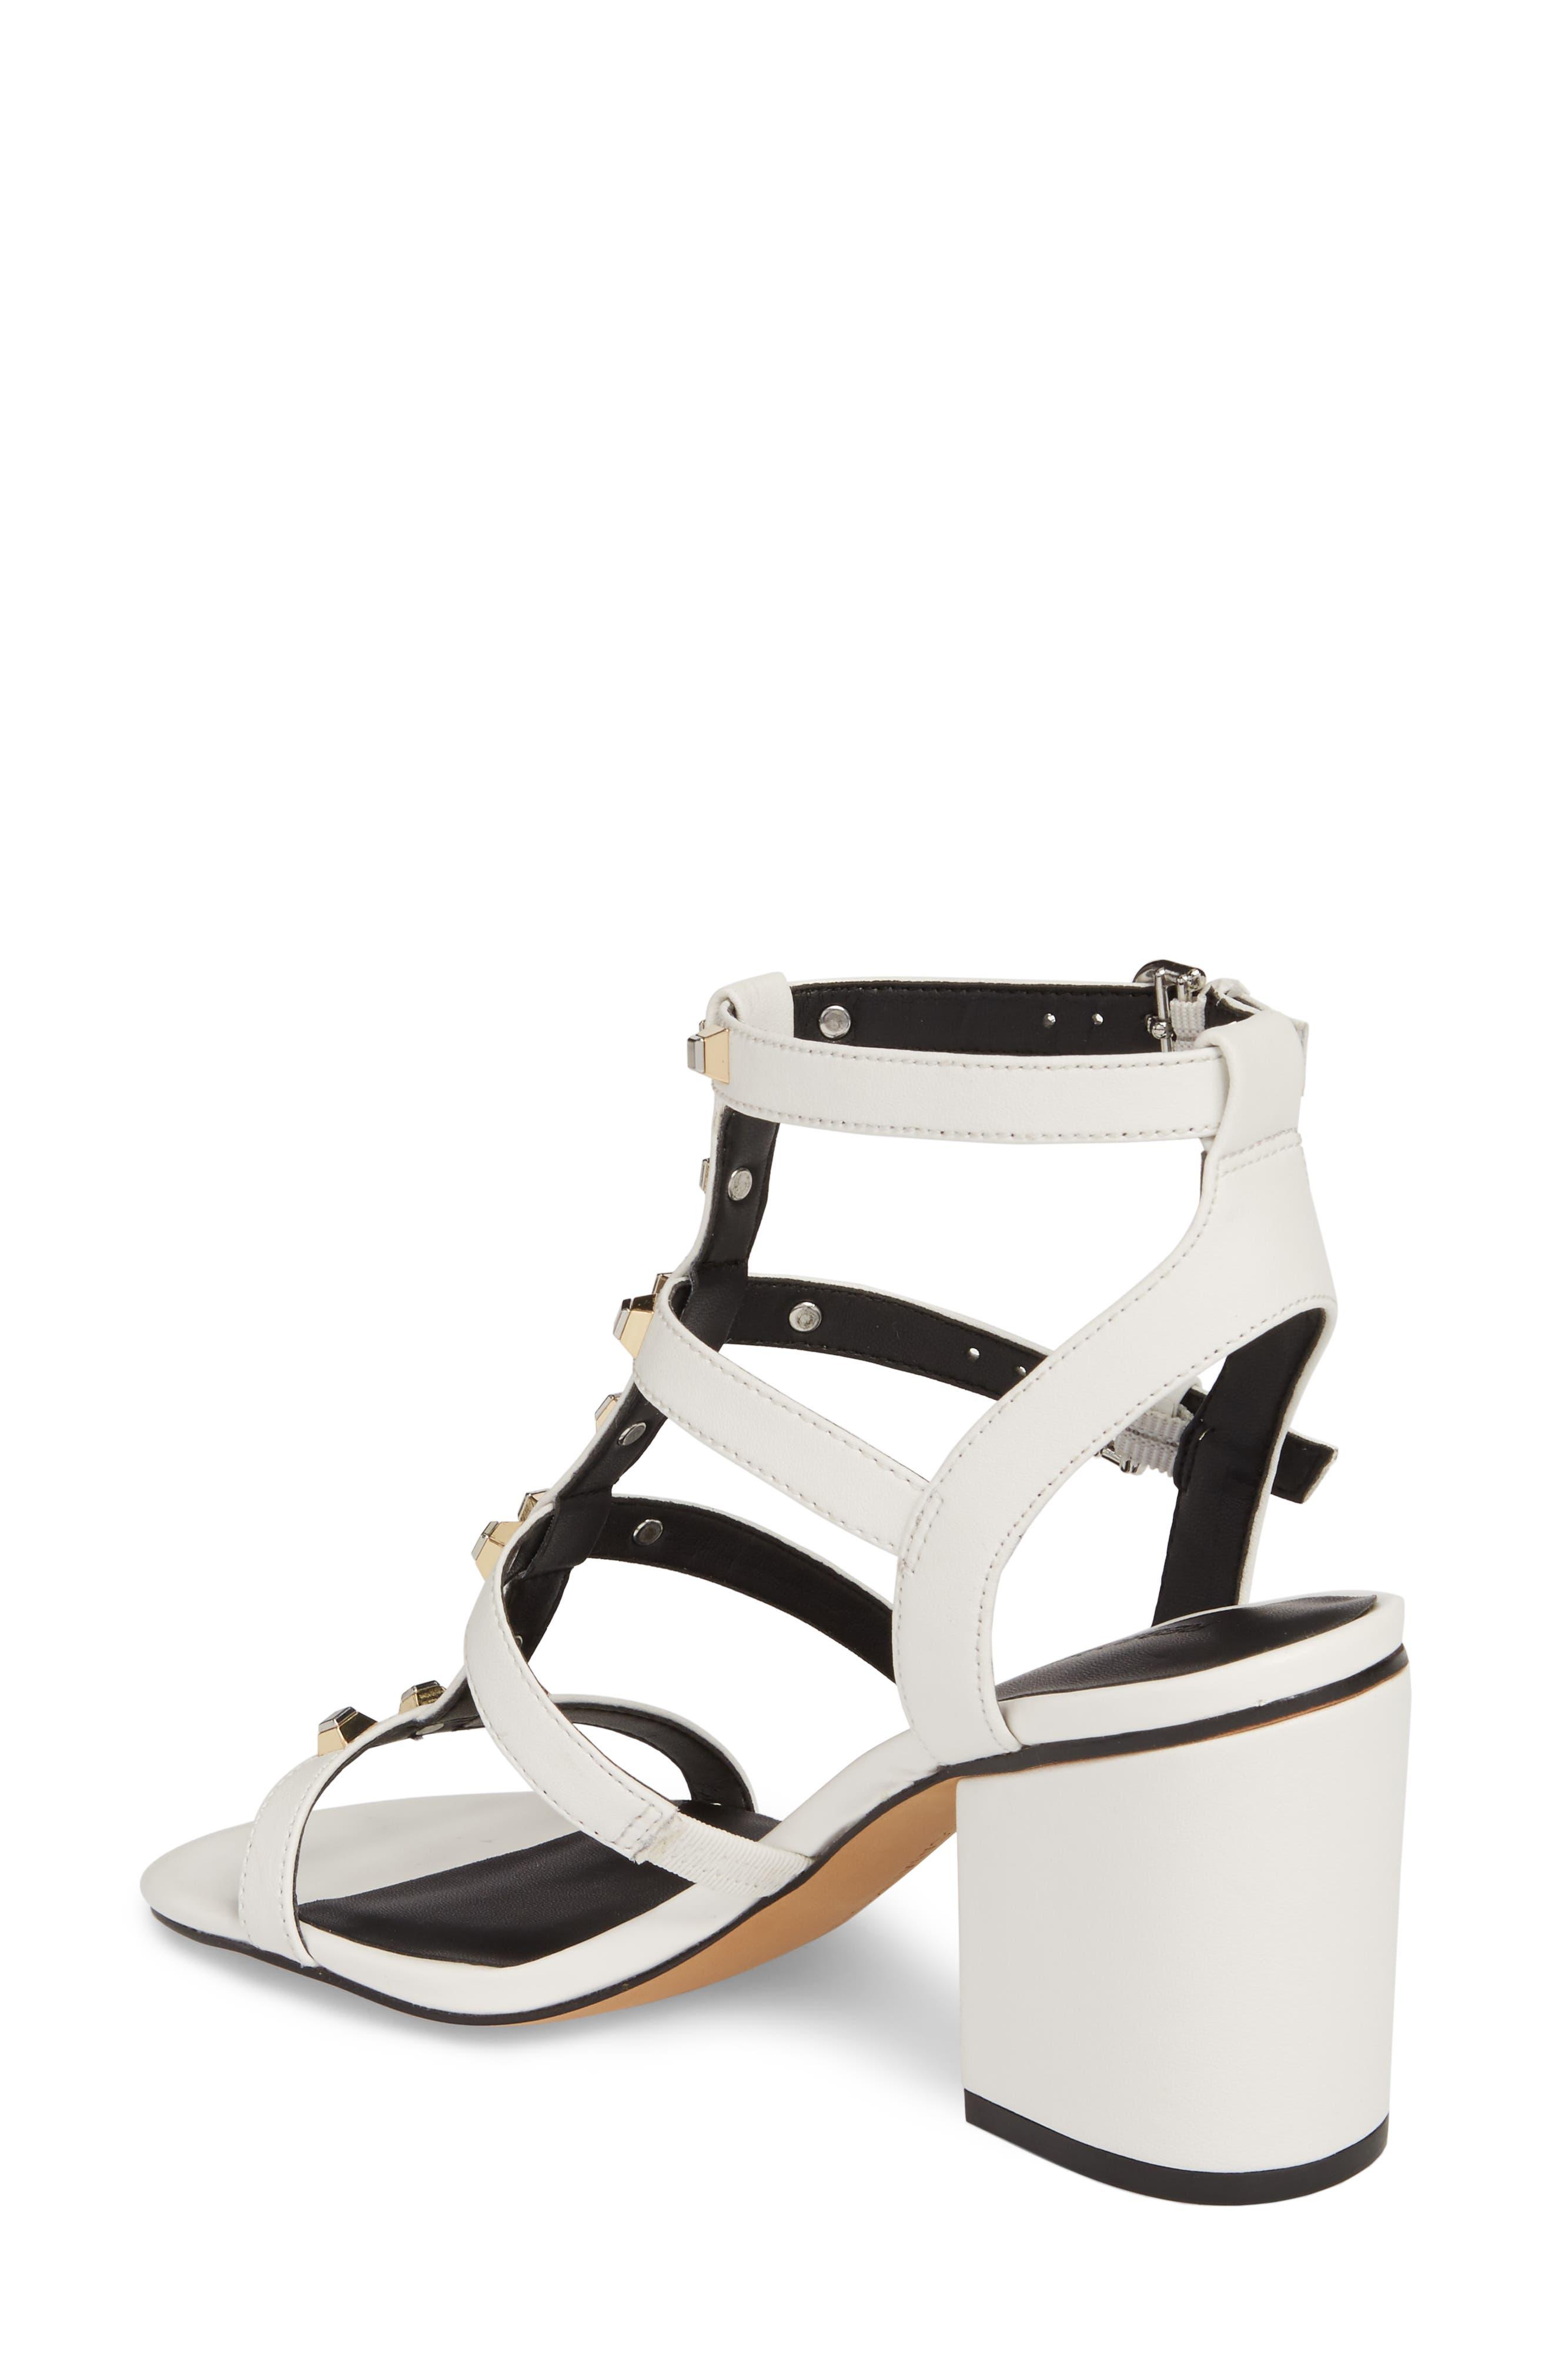 Lenore Sandal,                             Alternate thumbnail 2, color,                             Optic White Leather